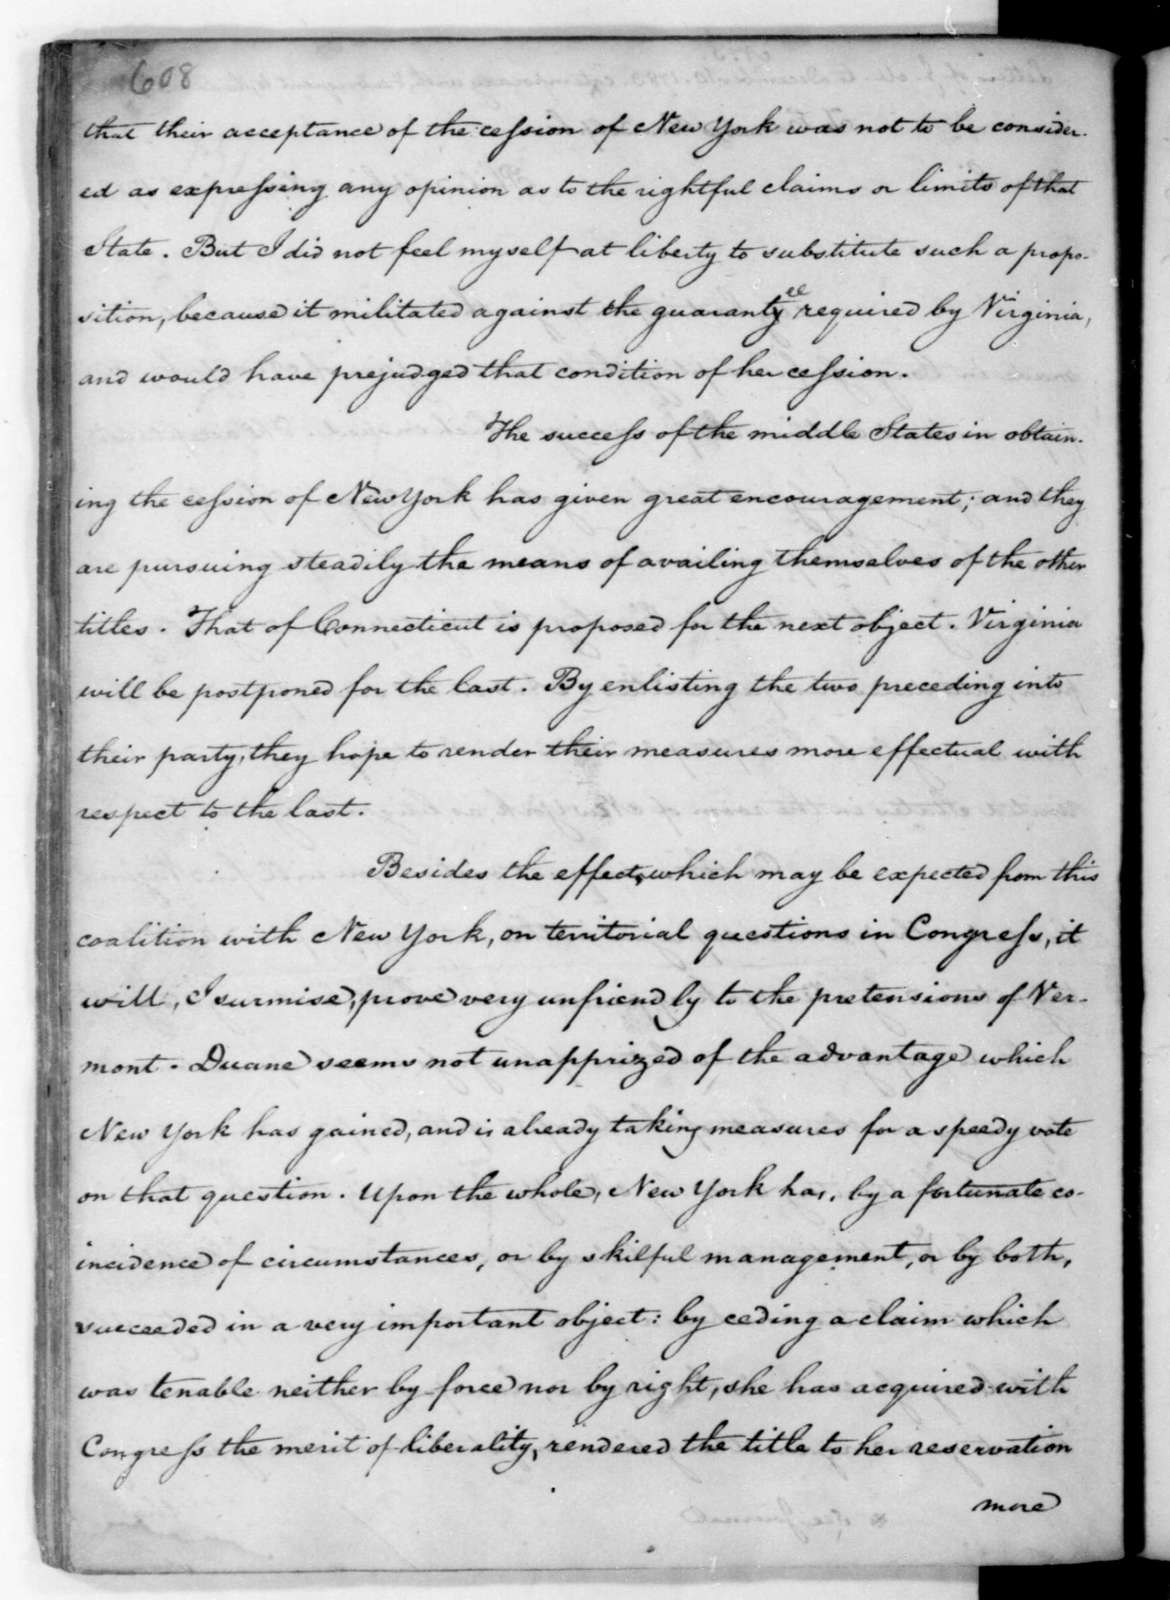 James Madison to Edmund Randolph, November 5, 1782.